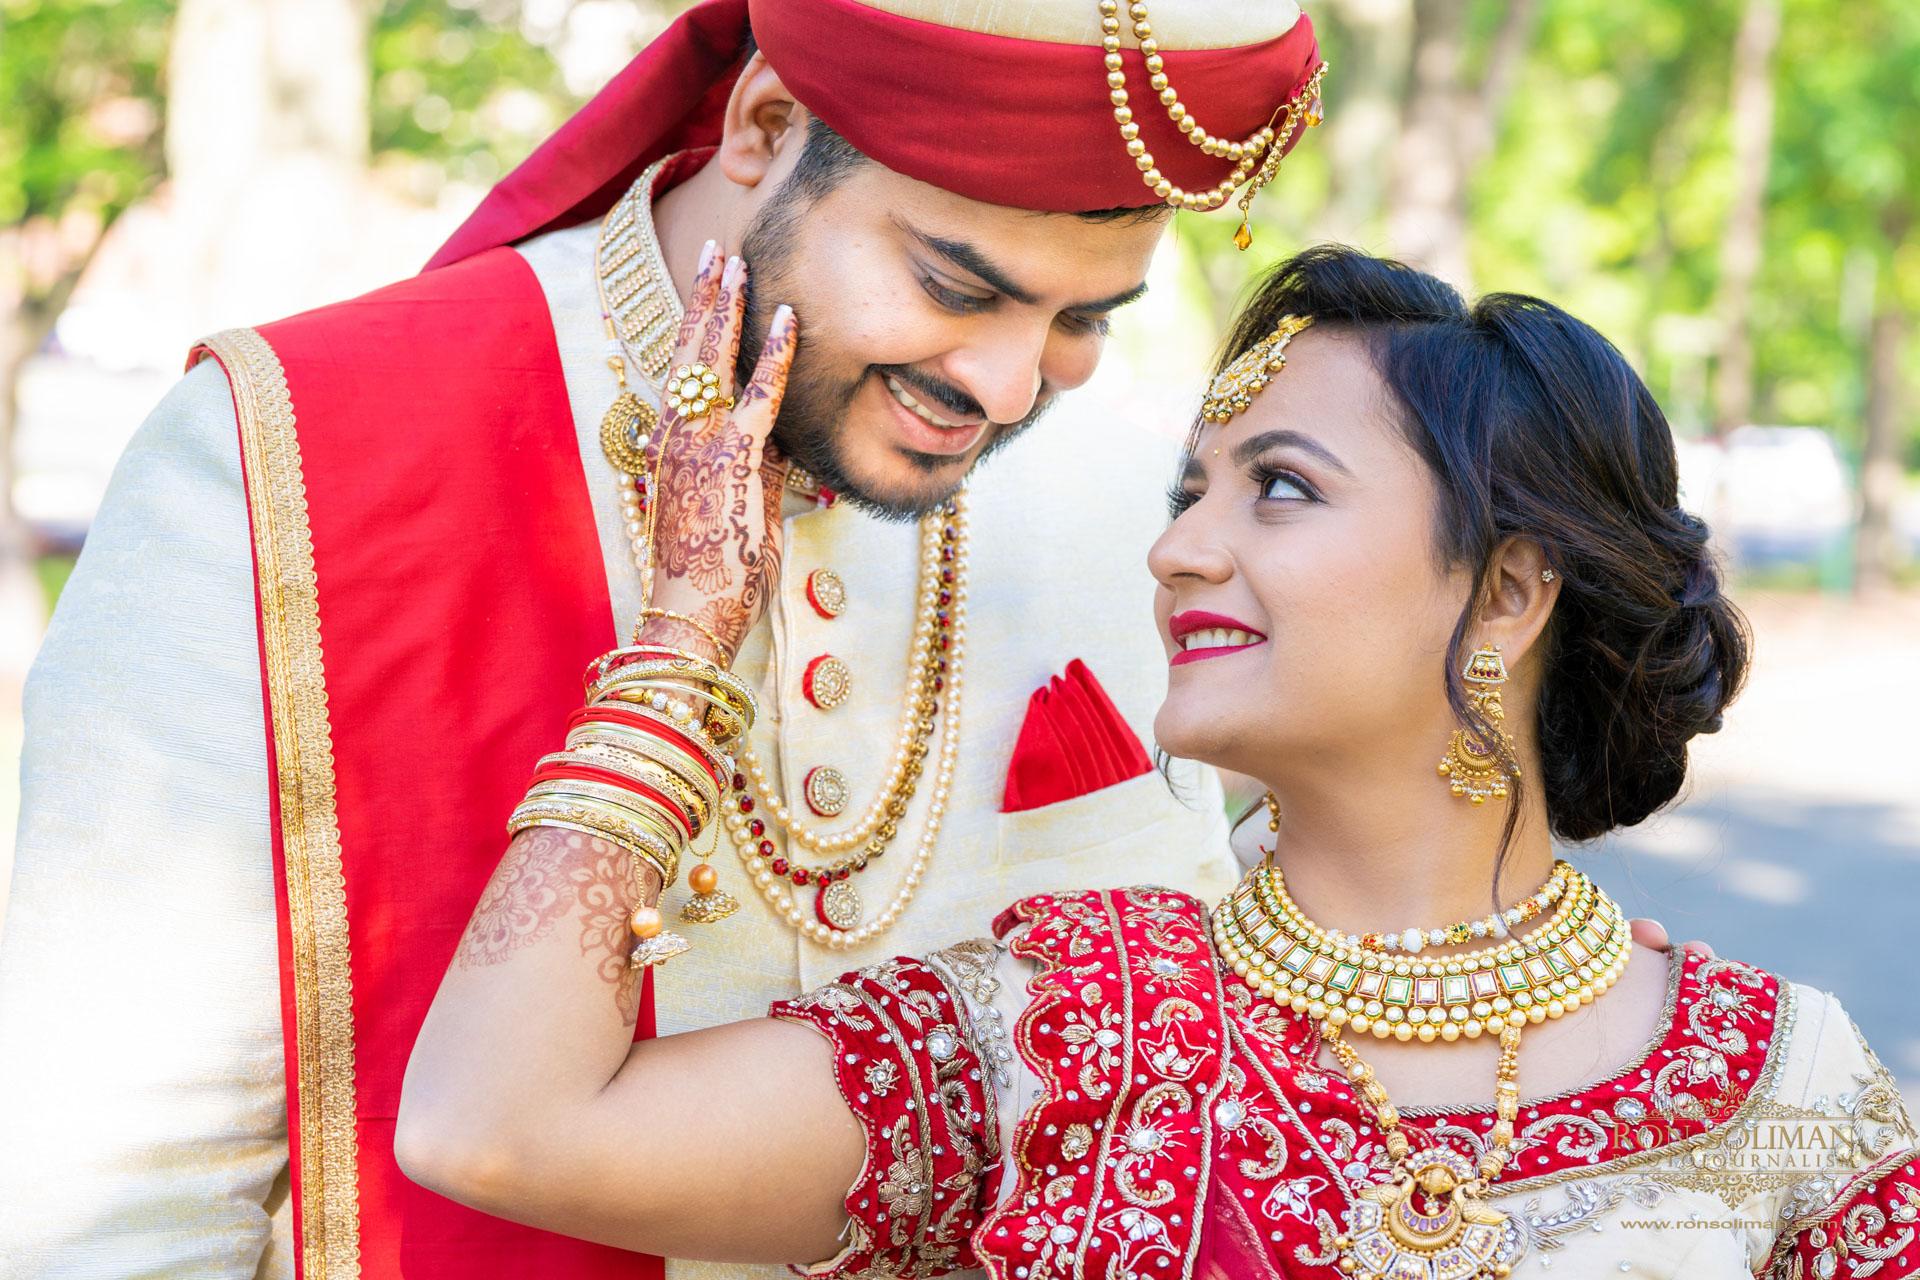 HILTON PARSIPANNY INDIAN WEDDING 15